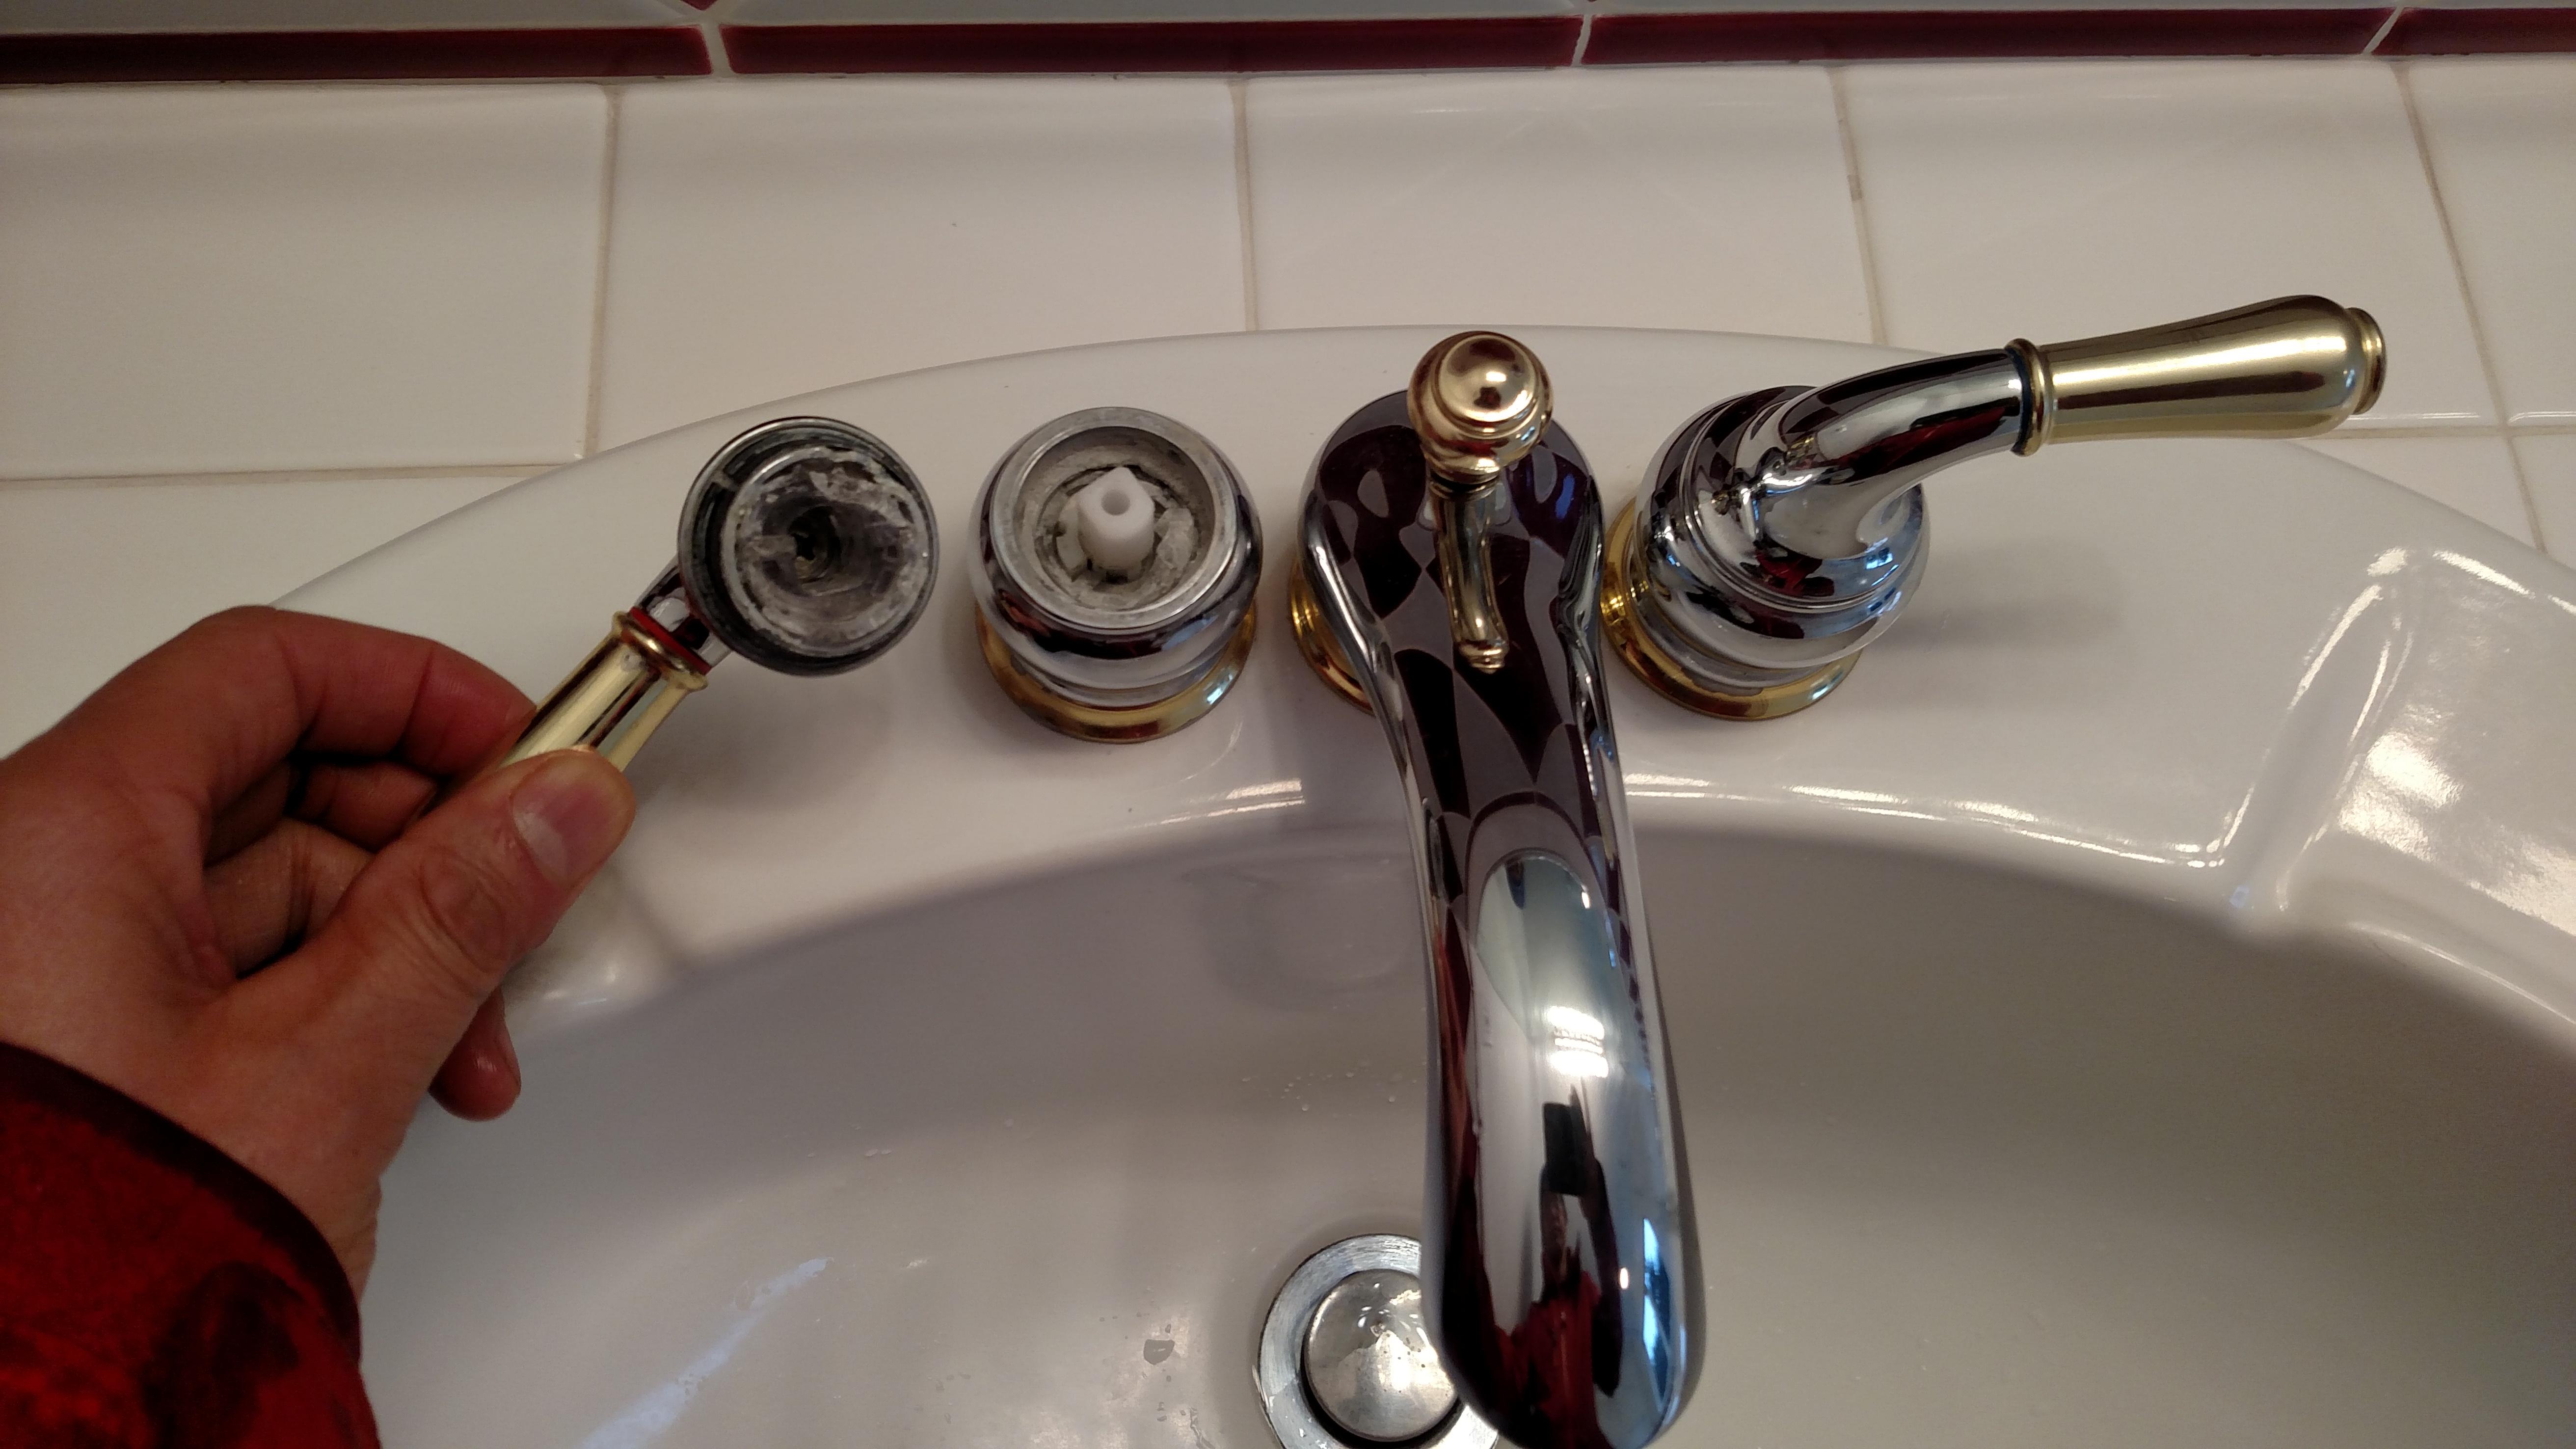 Moen Bathroom Faucet Handle Fell Off Image Of Bathroom And Closet